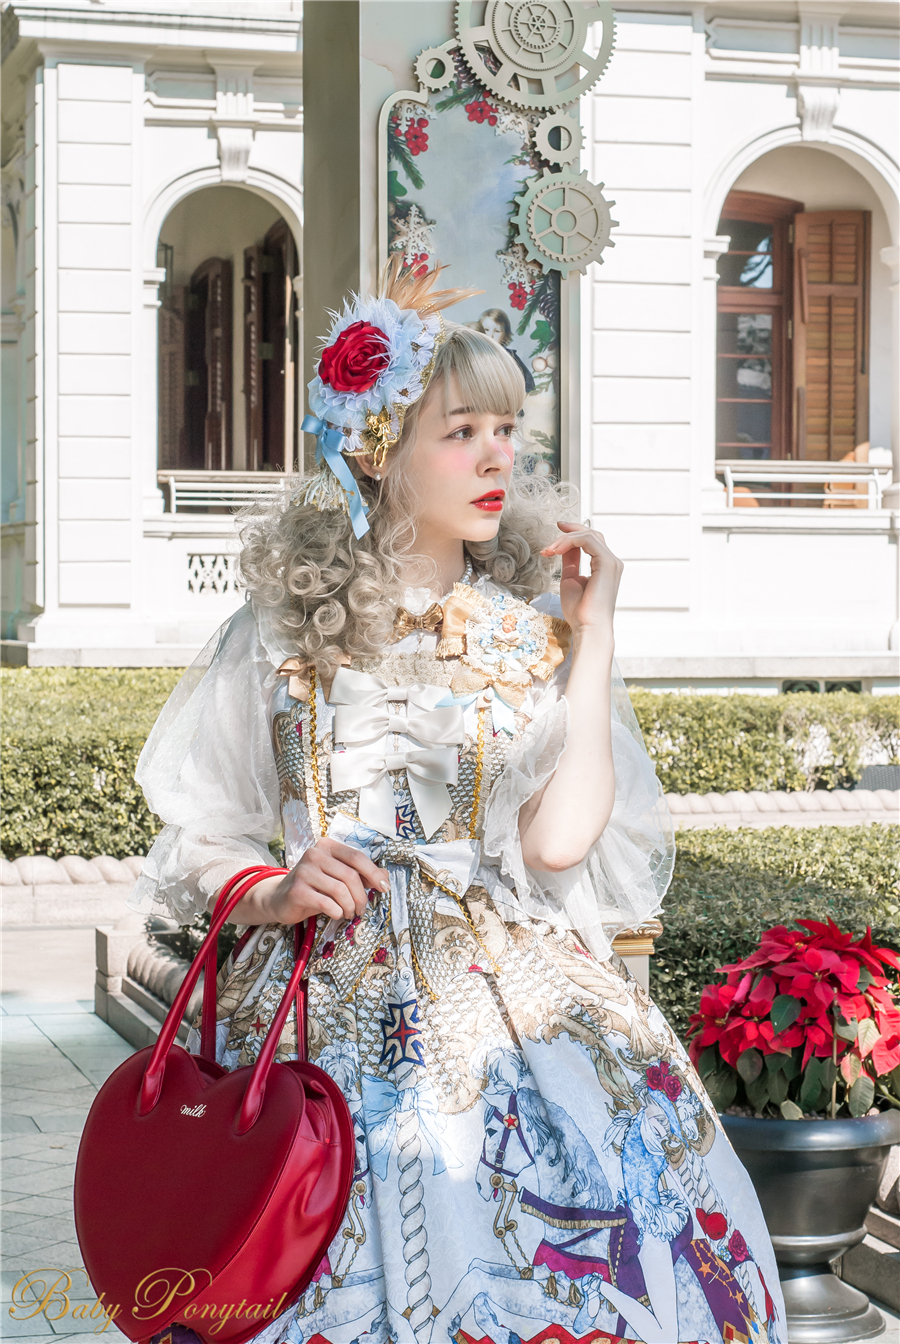 Baby Ponytail_Circus Princess_Silver JSK_Claudia11.jpg